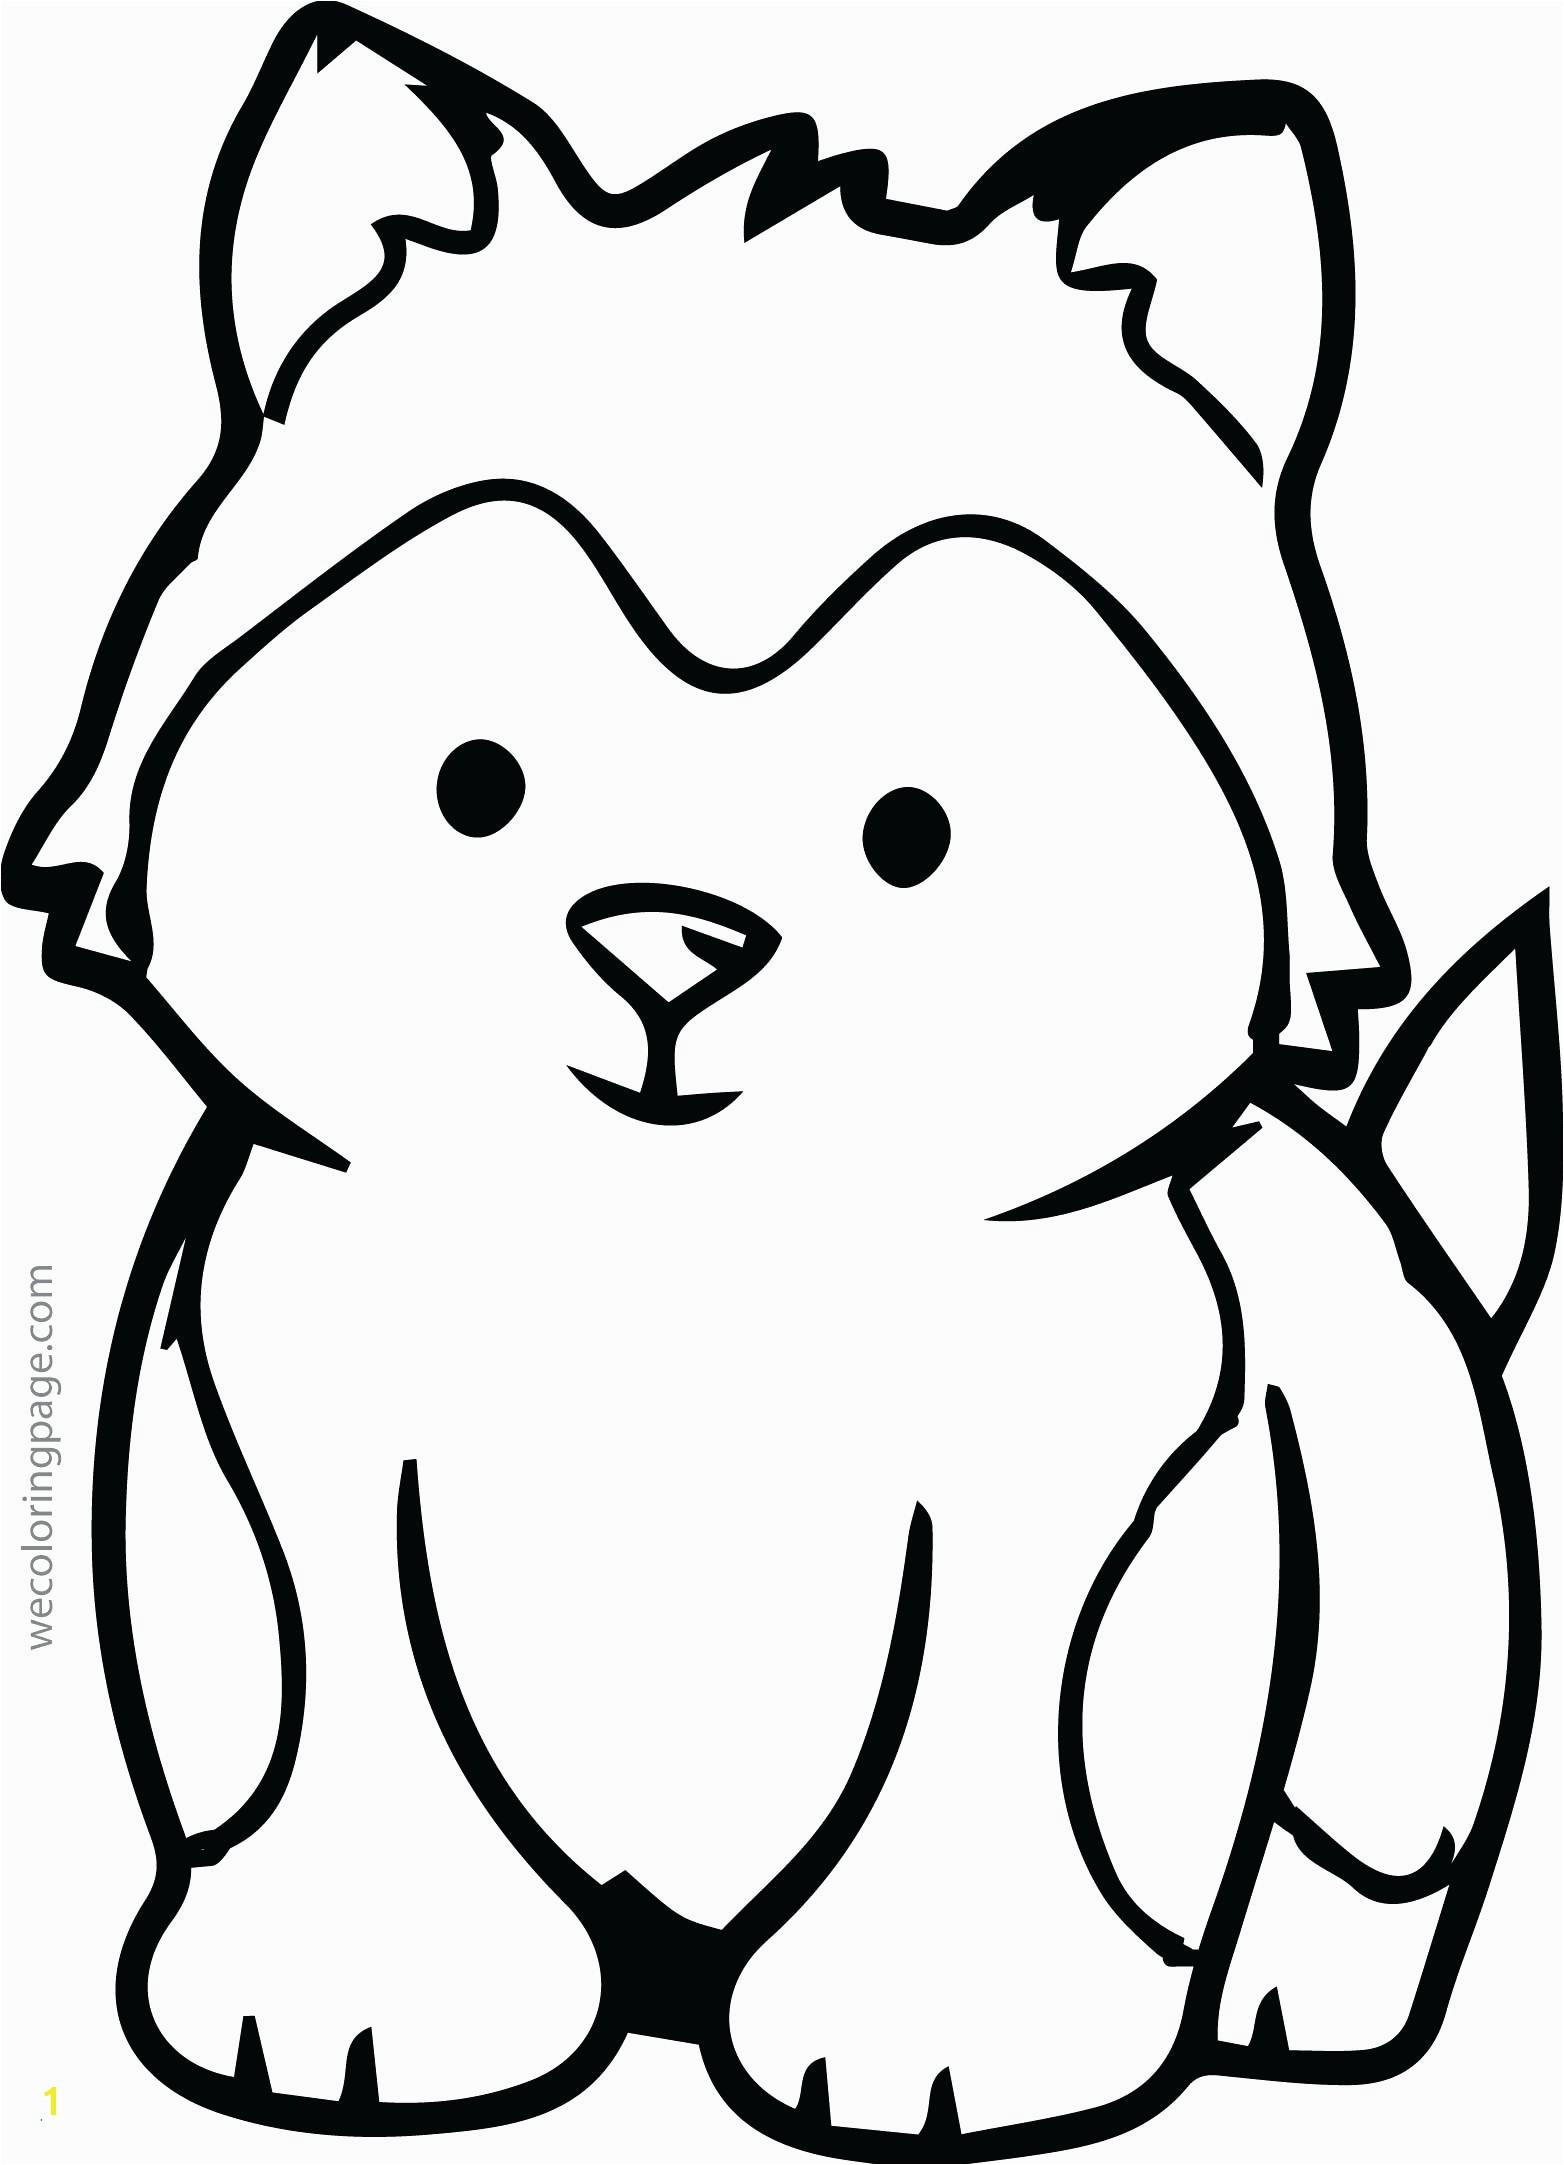 Washington Huskies Coloring Pages Animal Coloring Pages Elegant Husky Coloring 0d Free Coloring Pages